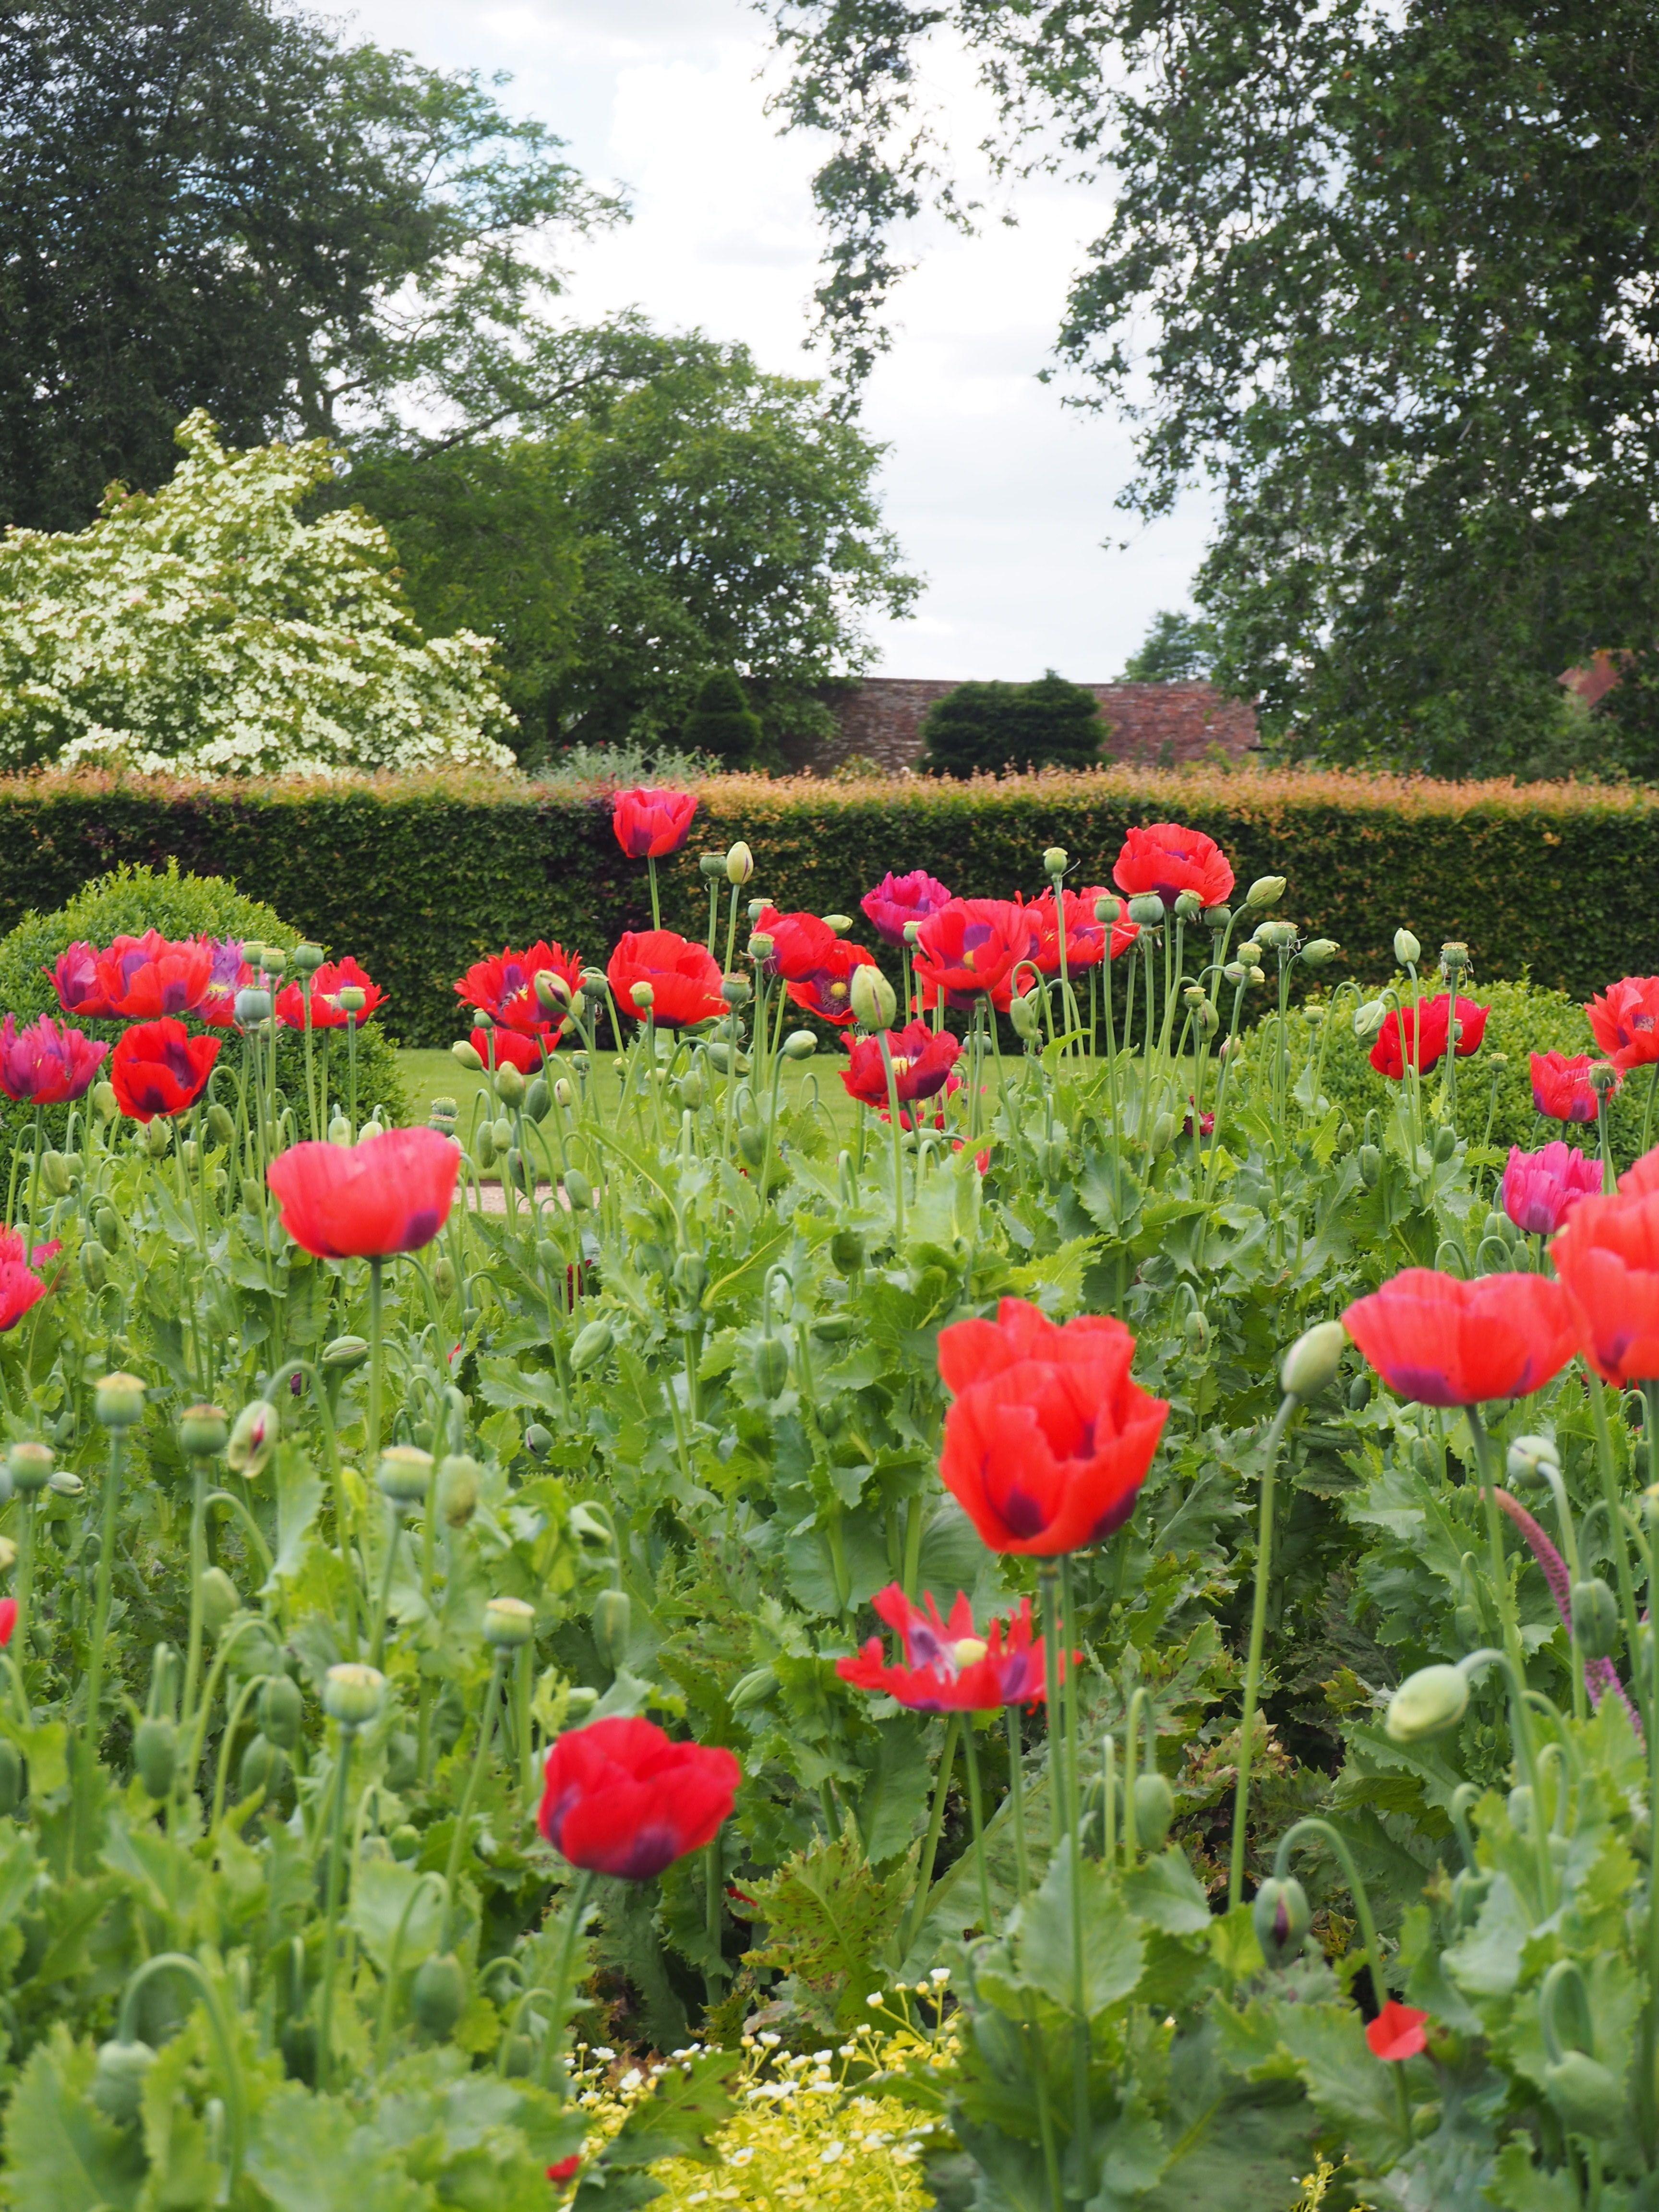 Englische Blumenarten Fur Den Garten Tea And Scones Blumenarten Pflanzen Englischer Garten